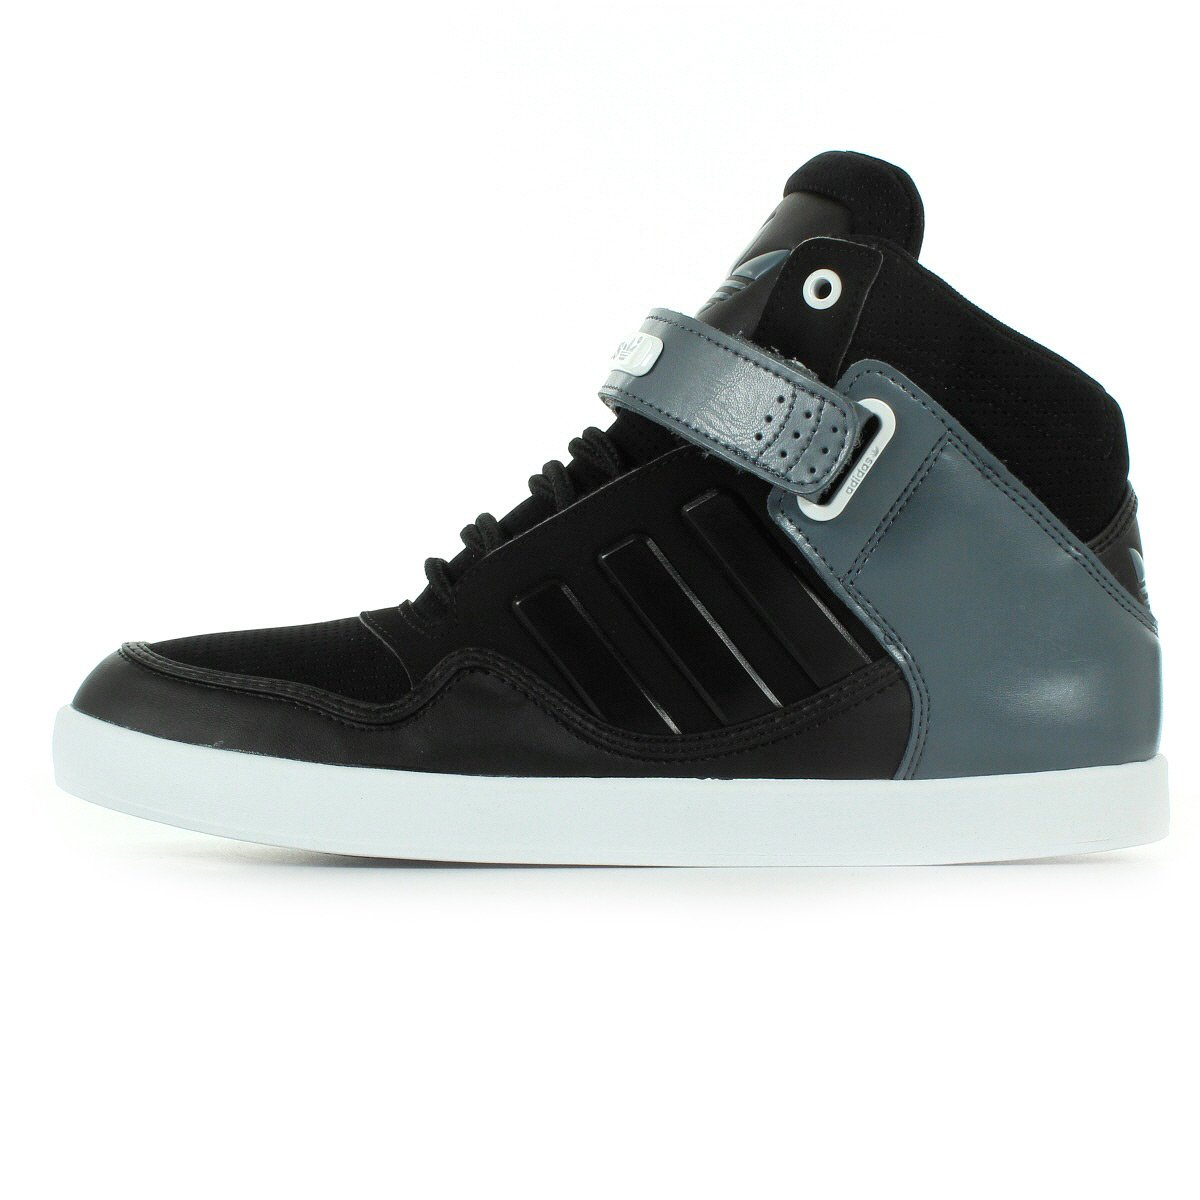 adidas Women's AR 2.0 Trainers Black Black Black Size: EU 44